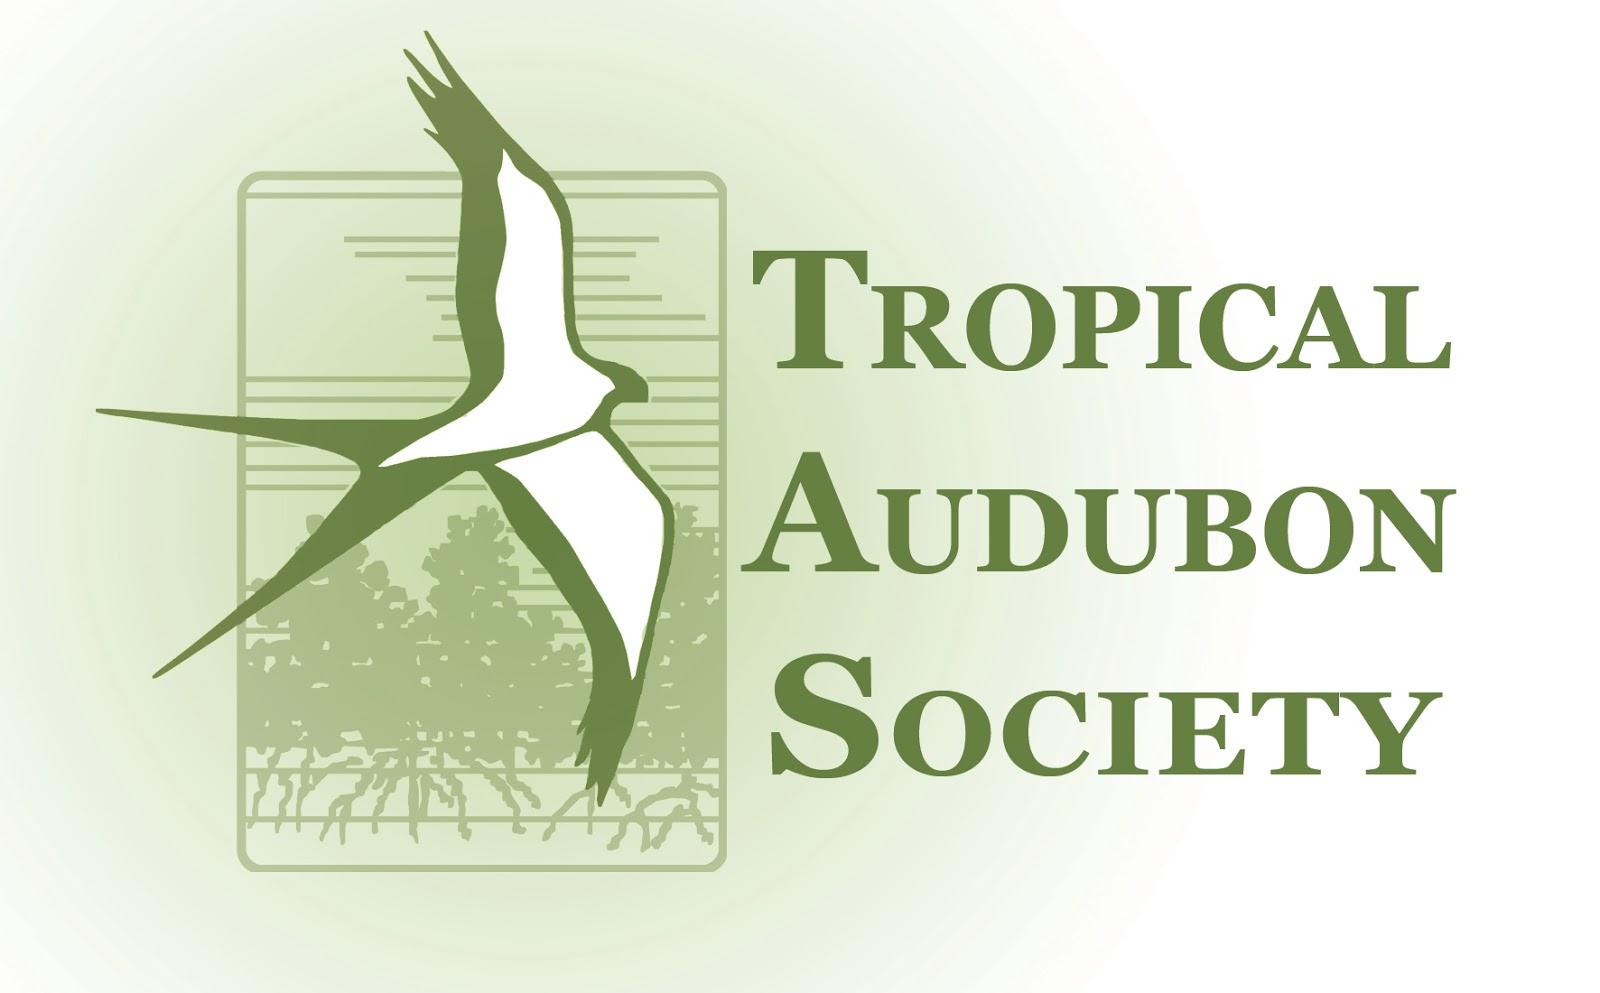 Audubon Society - Tropical logo.jpeg